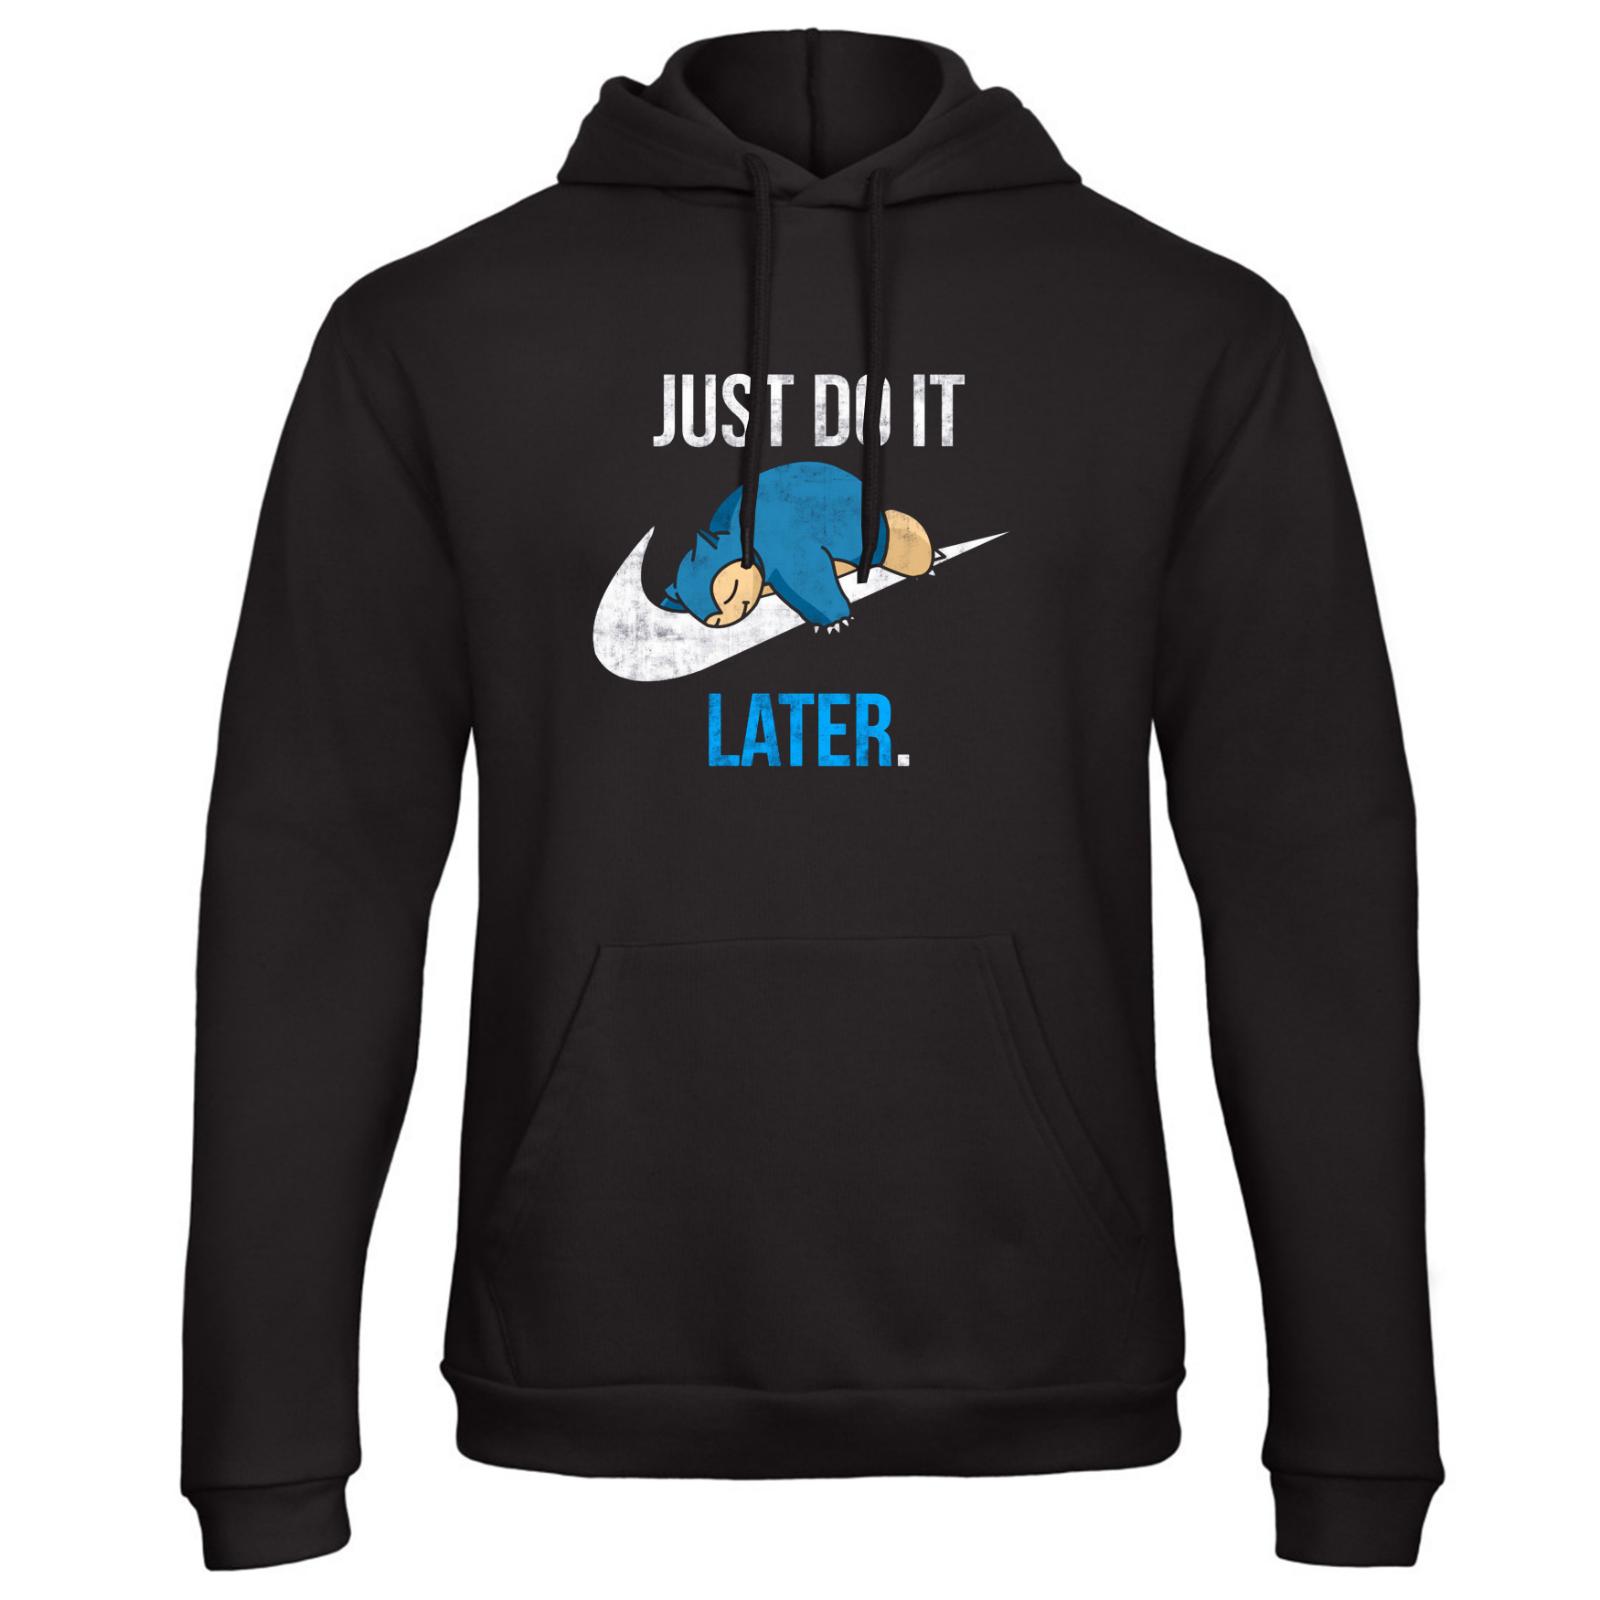 Just Do It Later Hoodie Pokemon Top Joke Lazy Nike Swoosh Gi